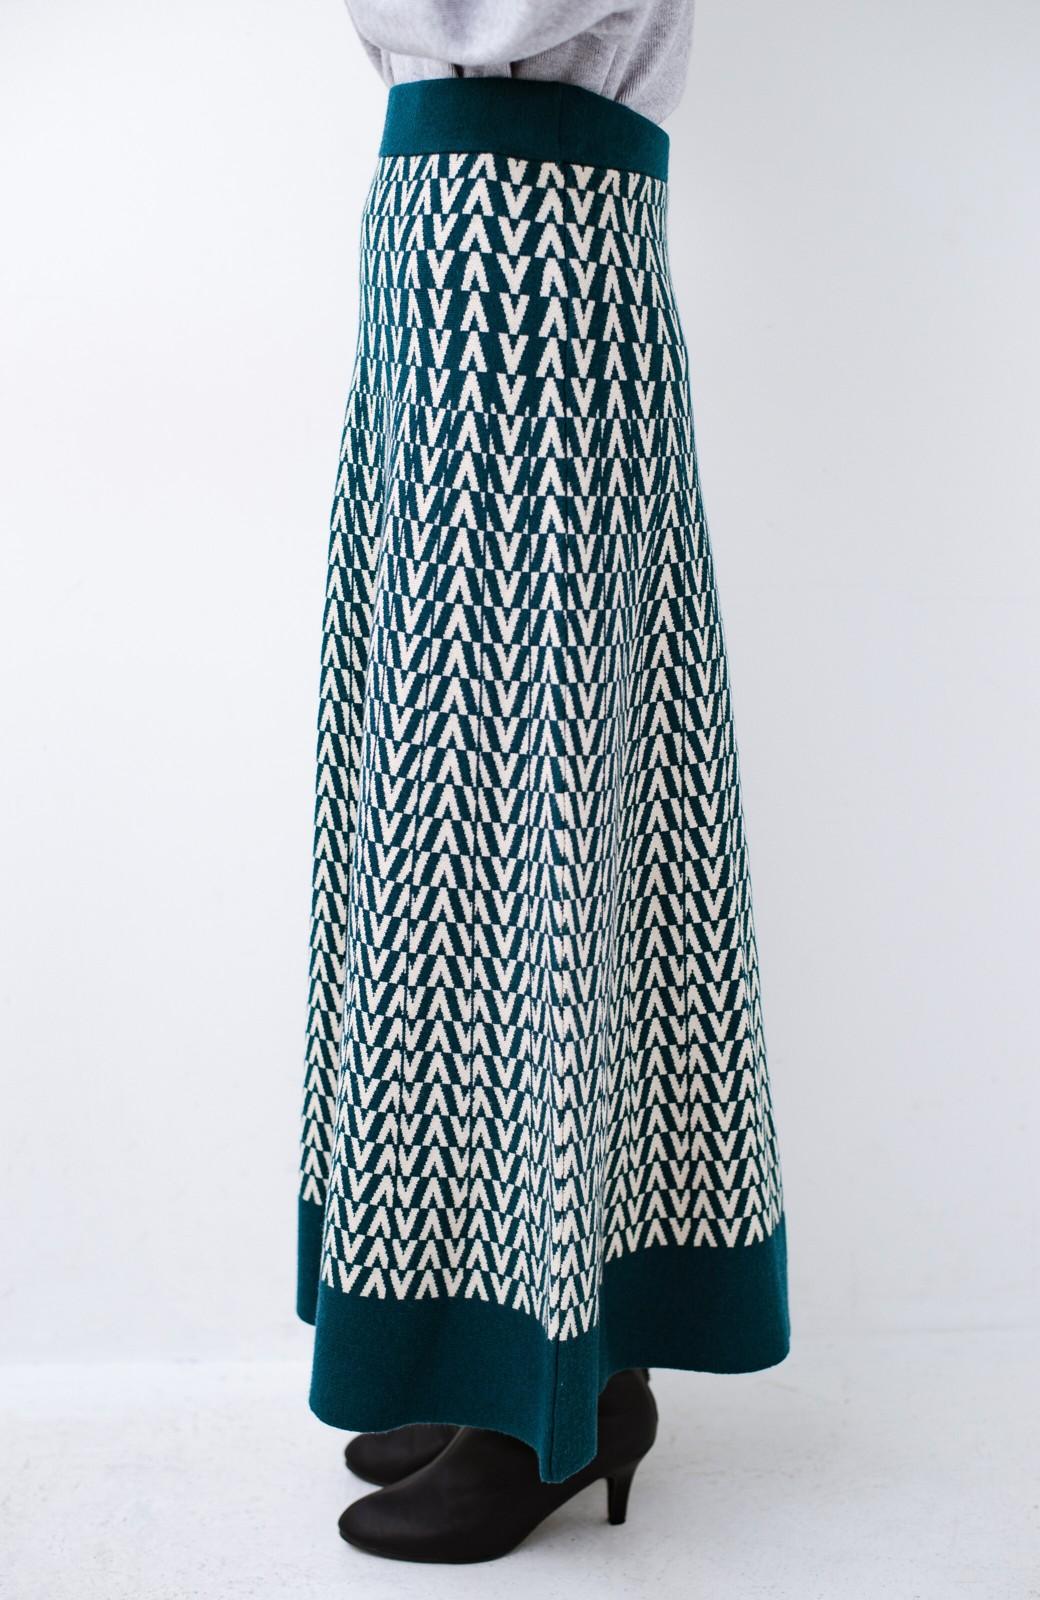 haco! シンプルトップスと合わせるだけでコーデがオシャレ&華やかになる ジャカードニットスカート <グリーン系その他>の商品写真6